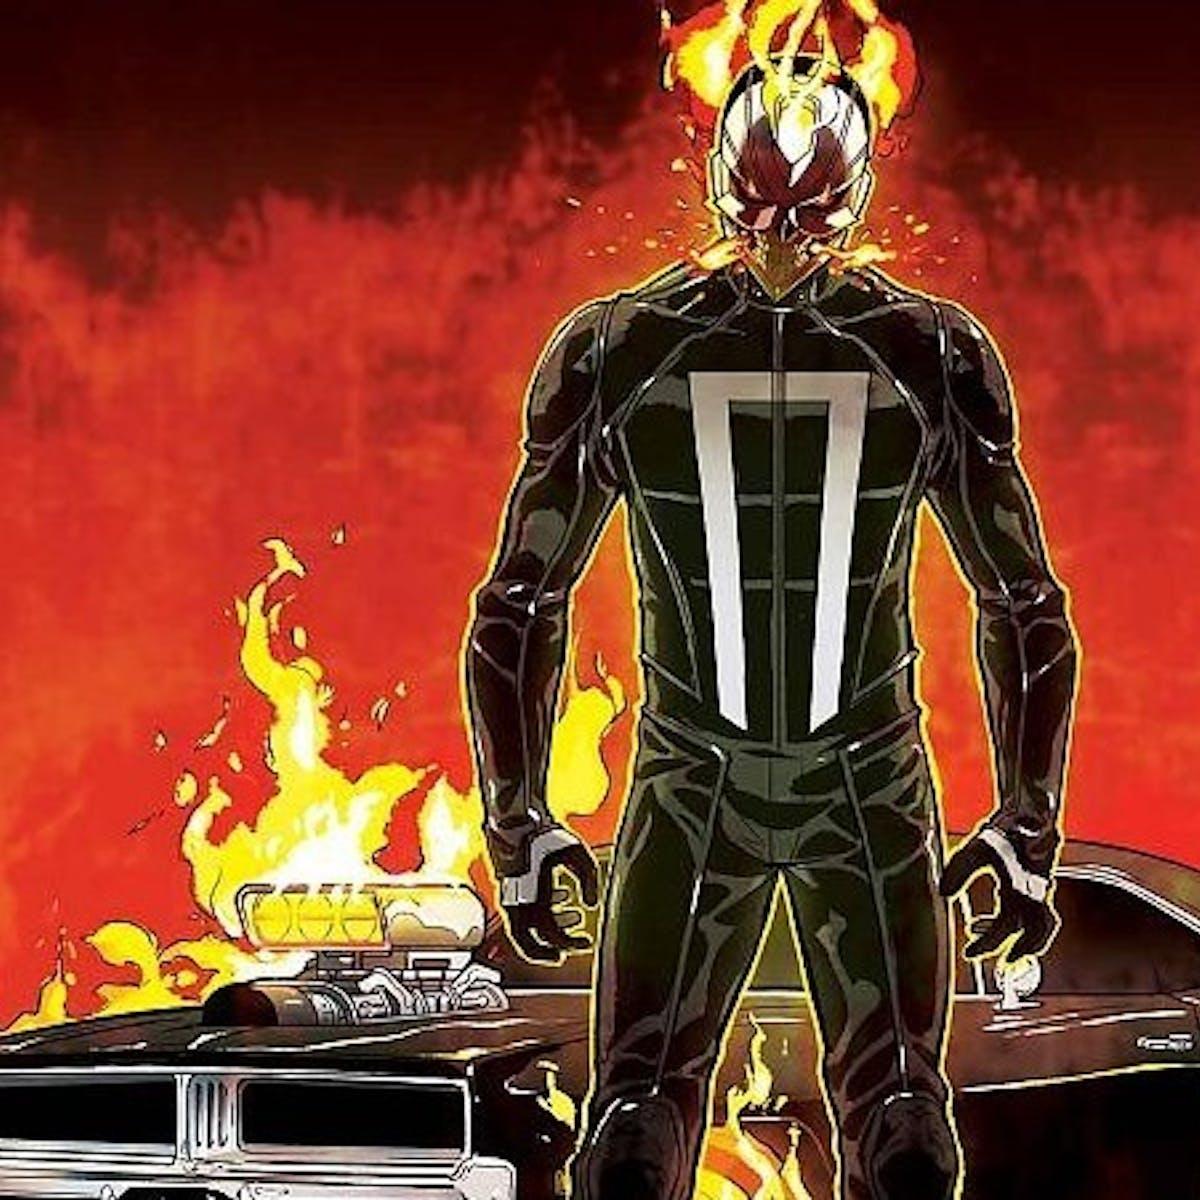 Marvel Might Make a Robbie Reyes 'Ghost Rider' Movie | Inverse